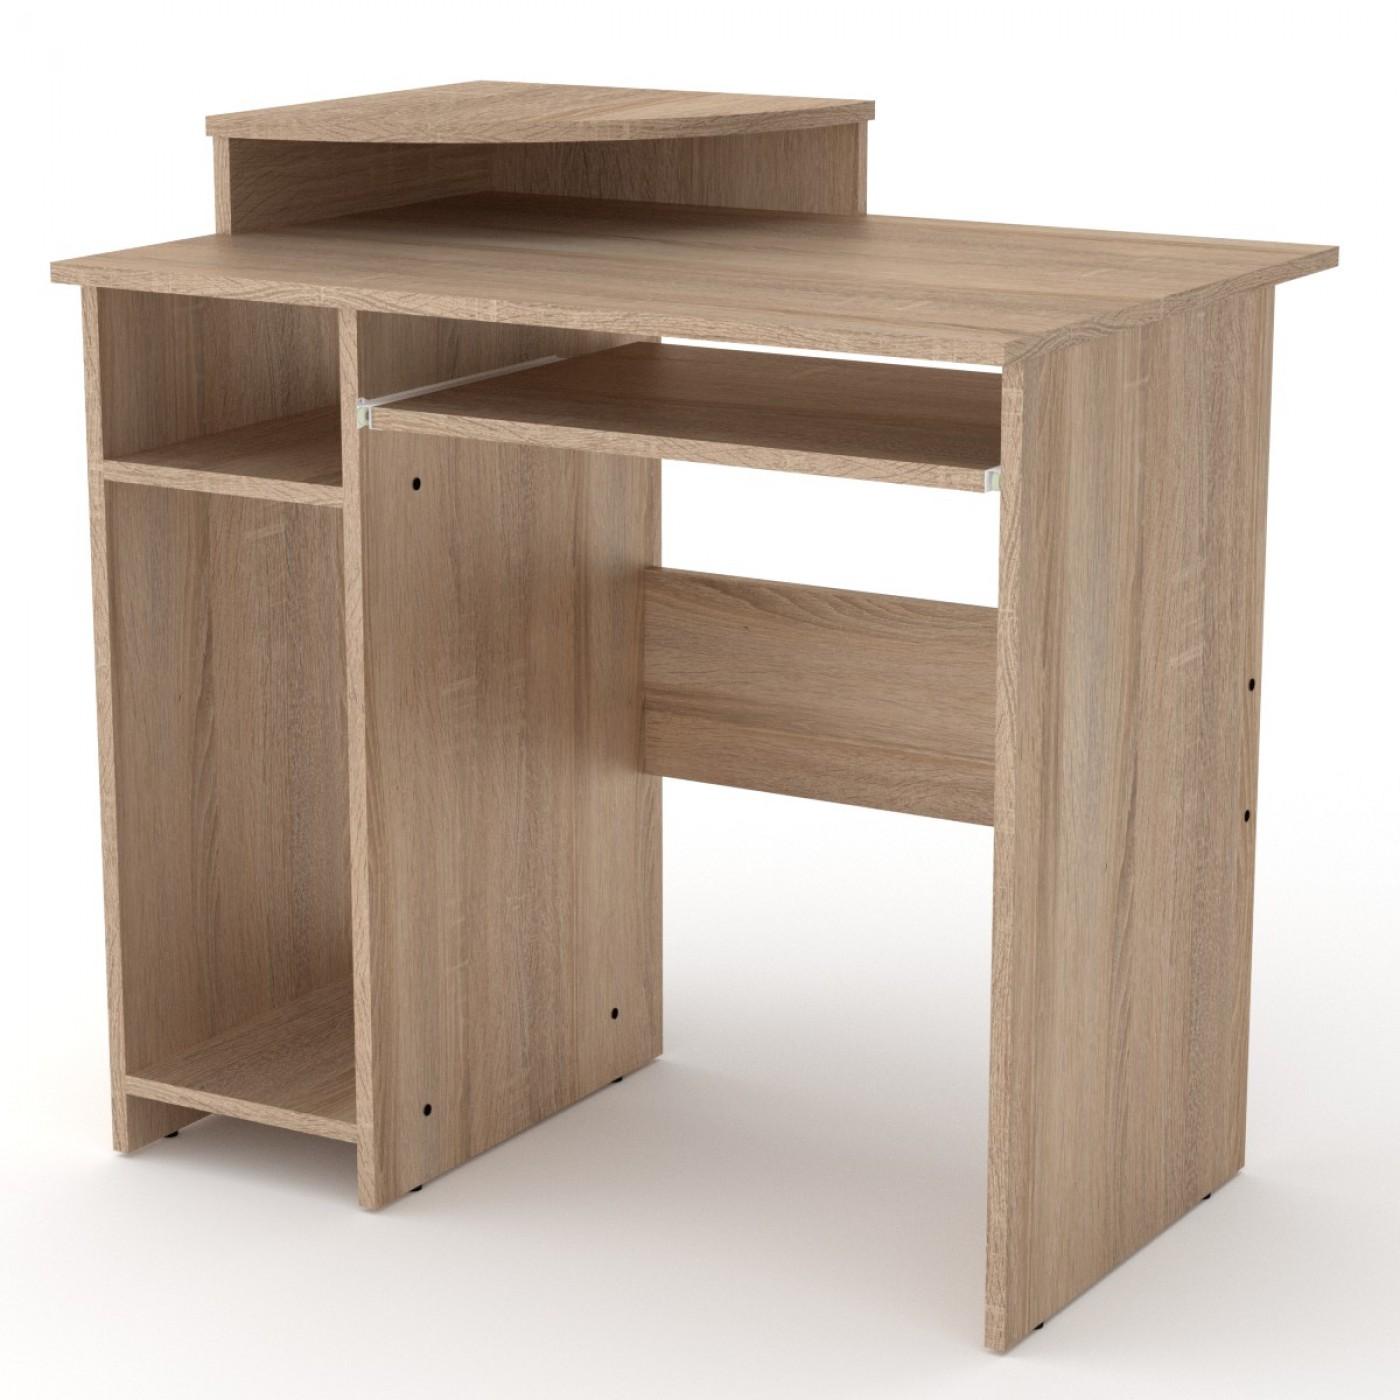 СКМ-1 стол компьютерный